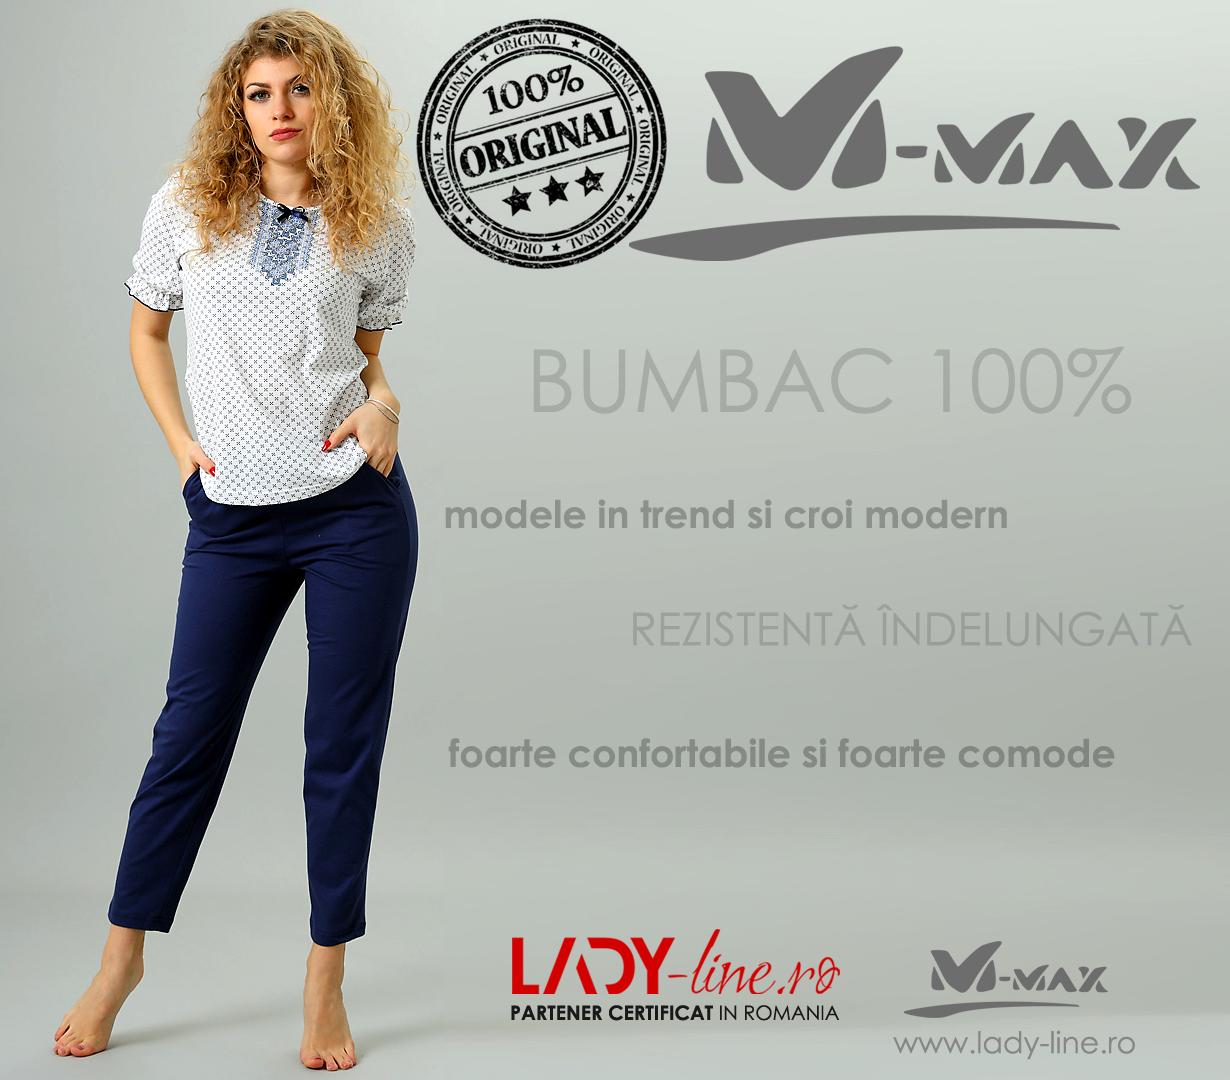 Pijama Dama M-Max, Bumbac 100%, 'Tradition'